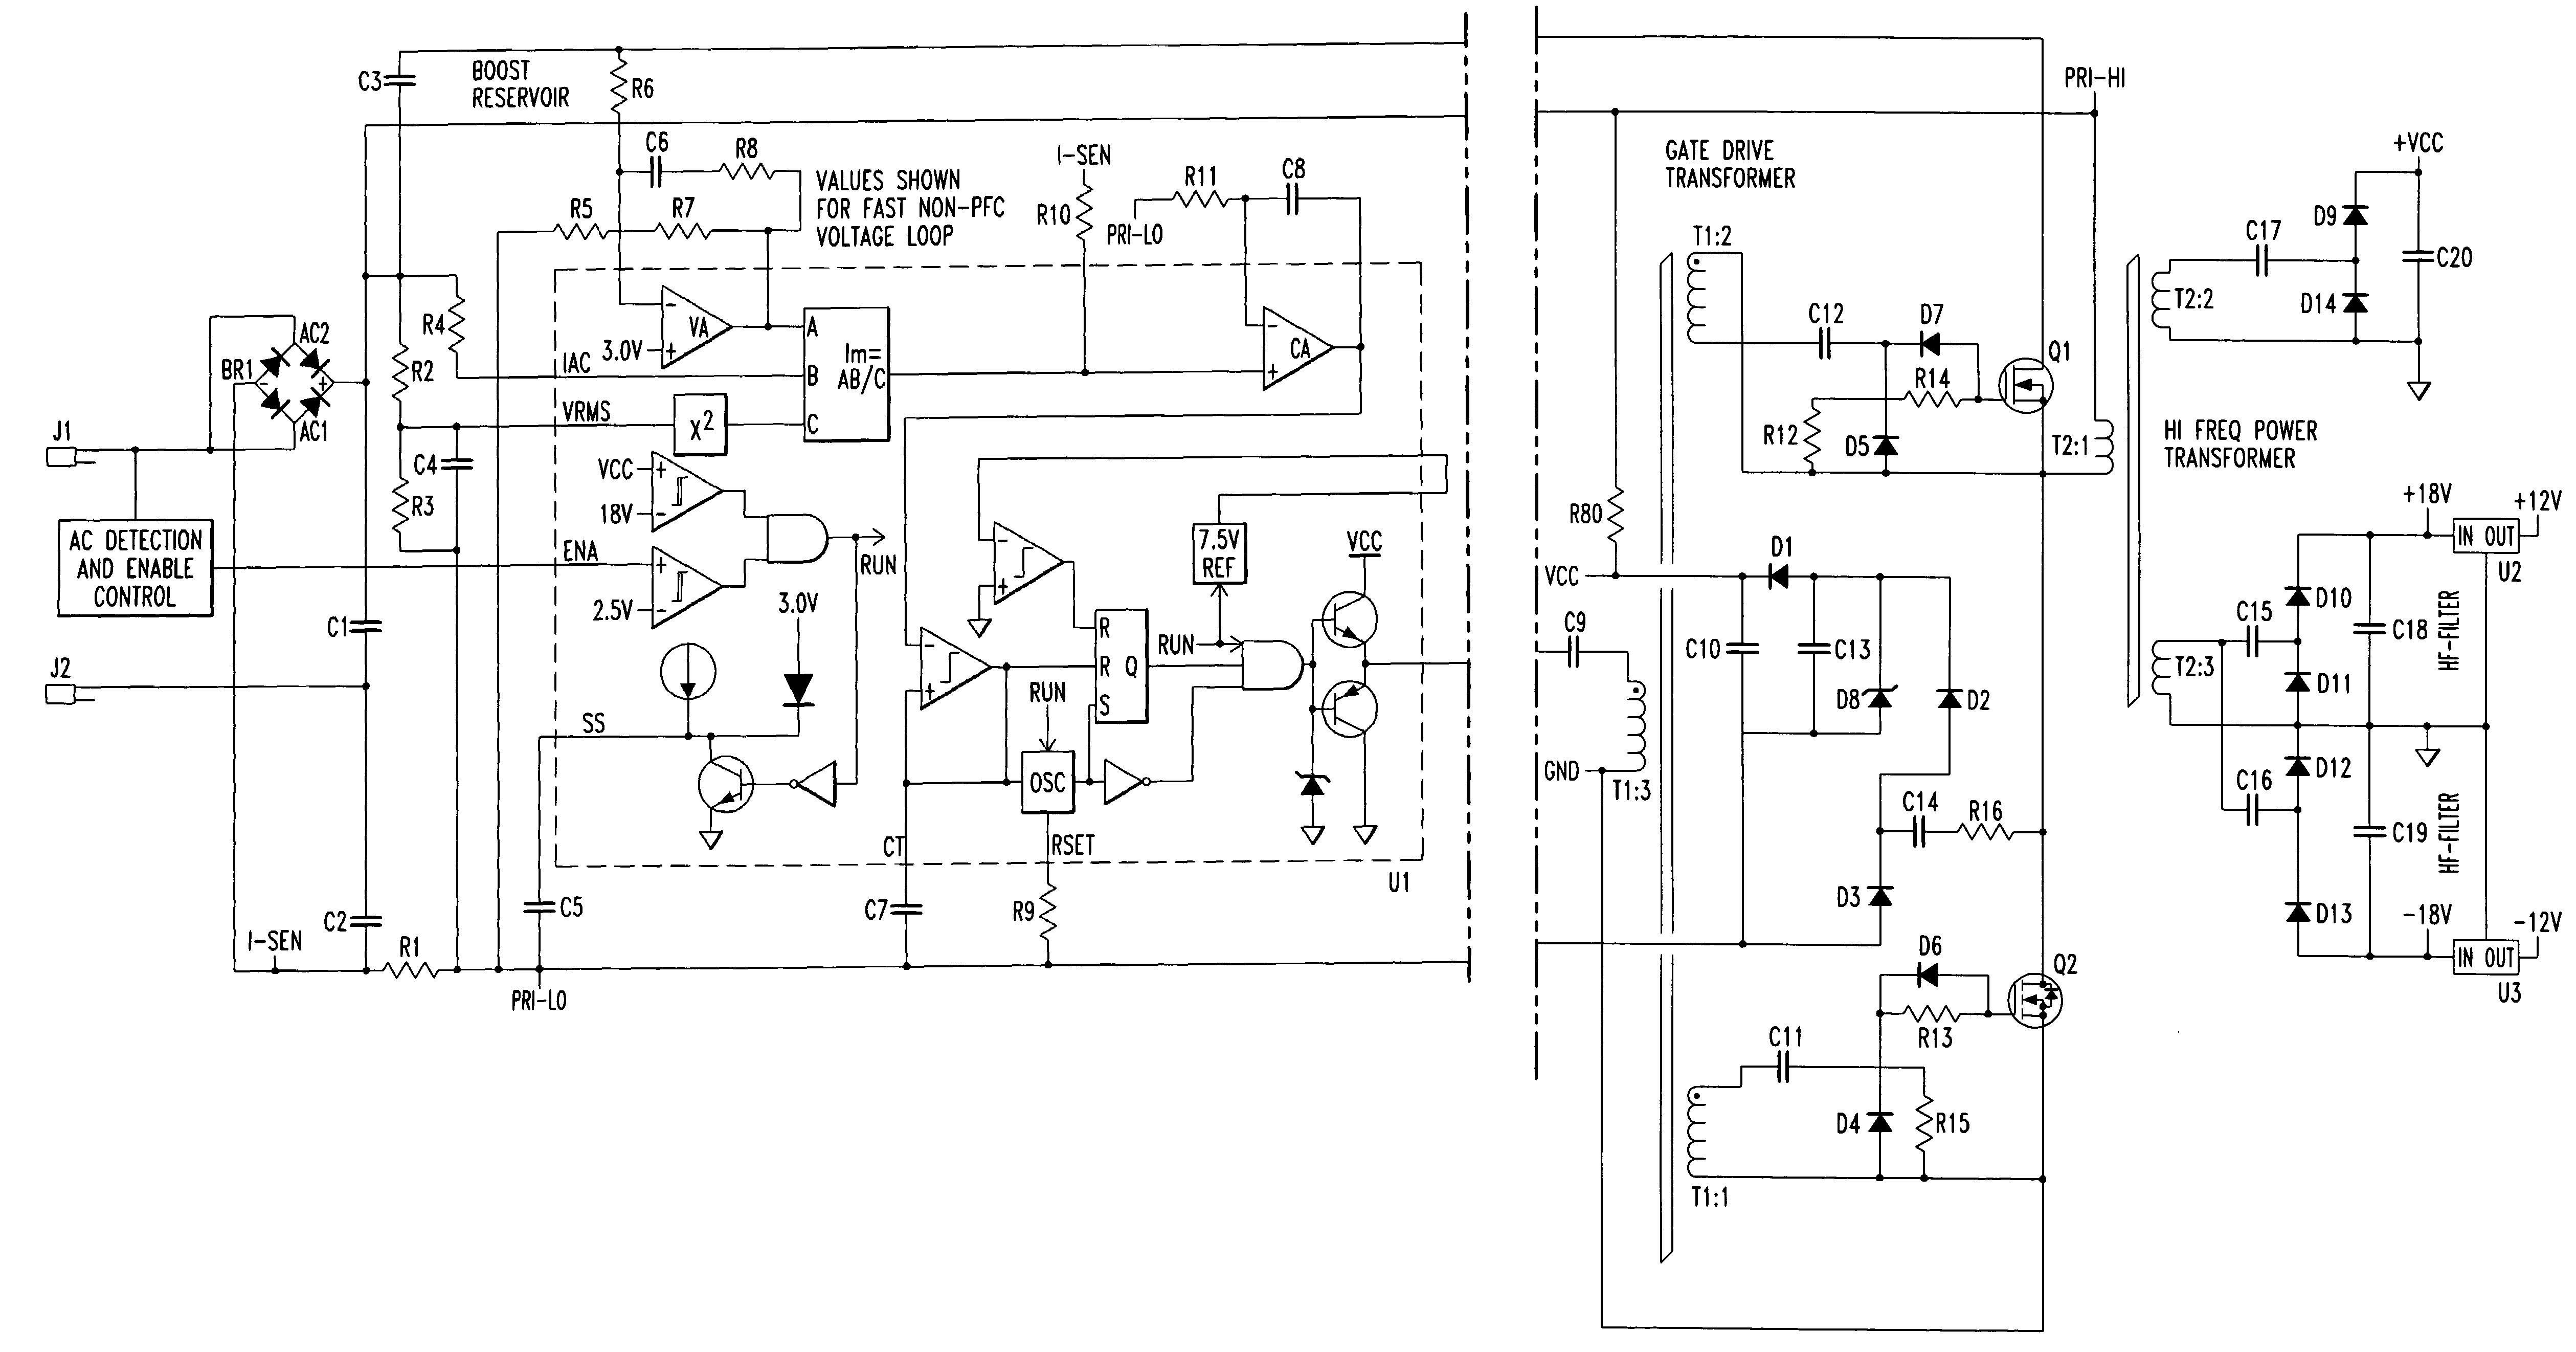 Qsc Power Amplifier Schematic Diagram Power Amplifier Schematic